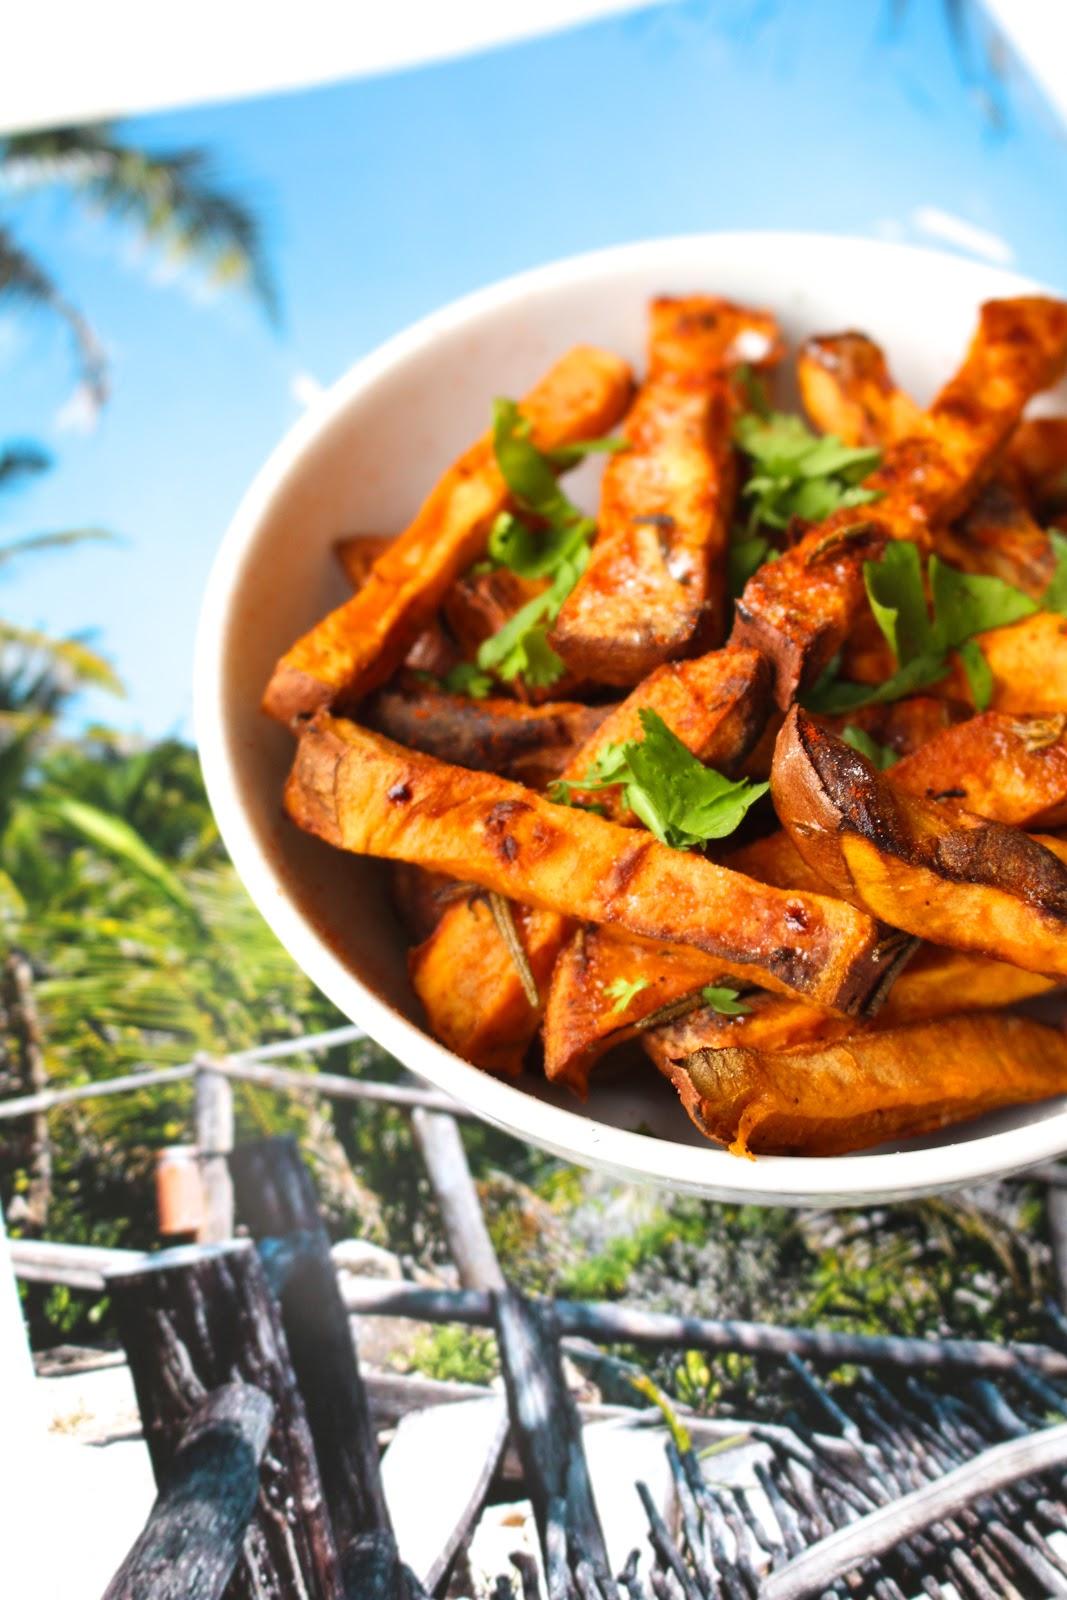 Easy & basic sweet potato fries recipe